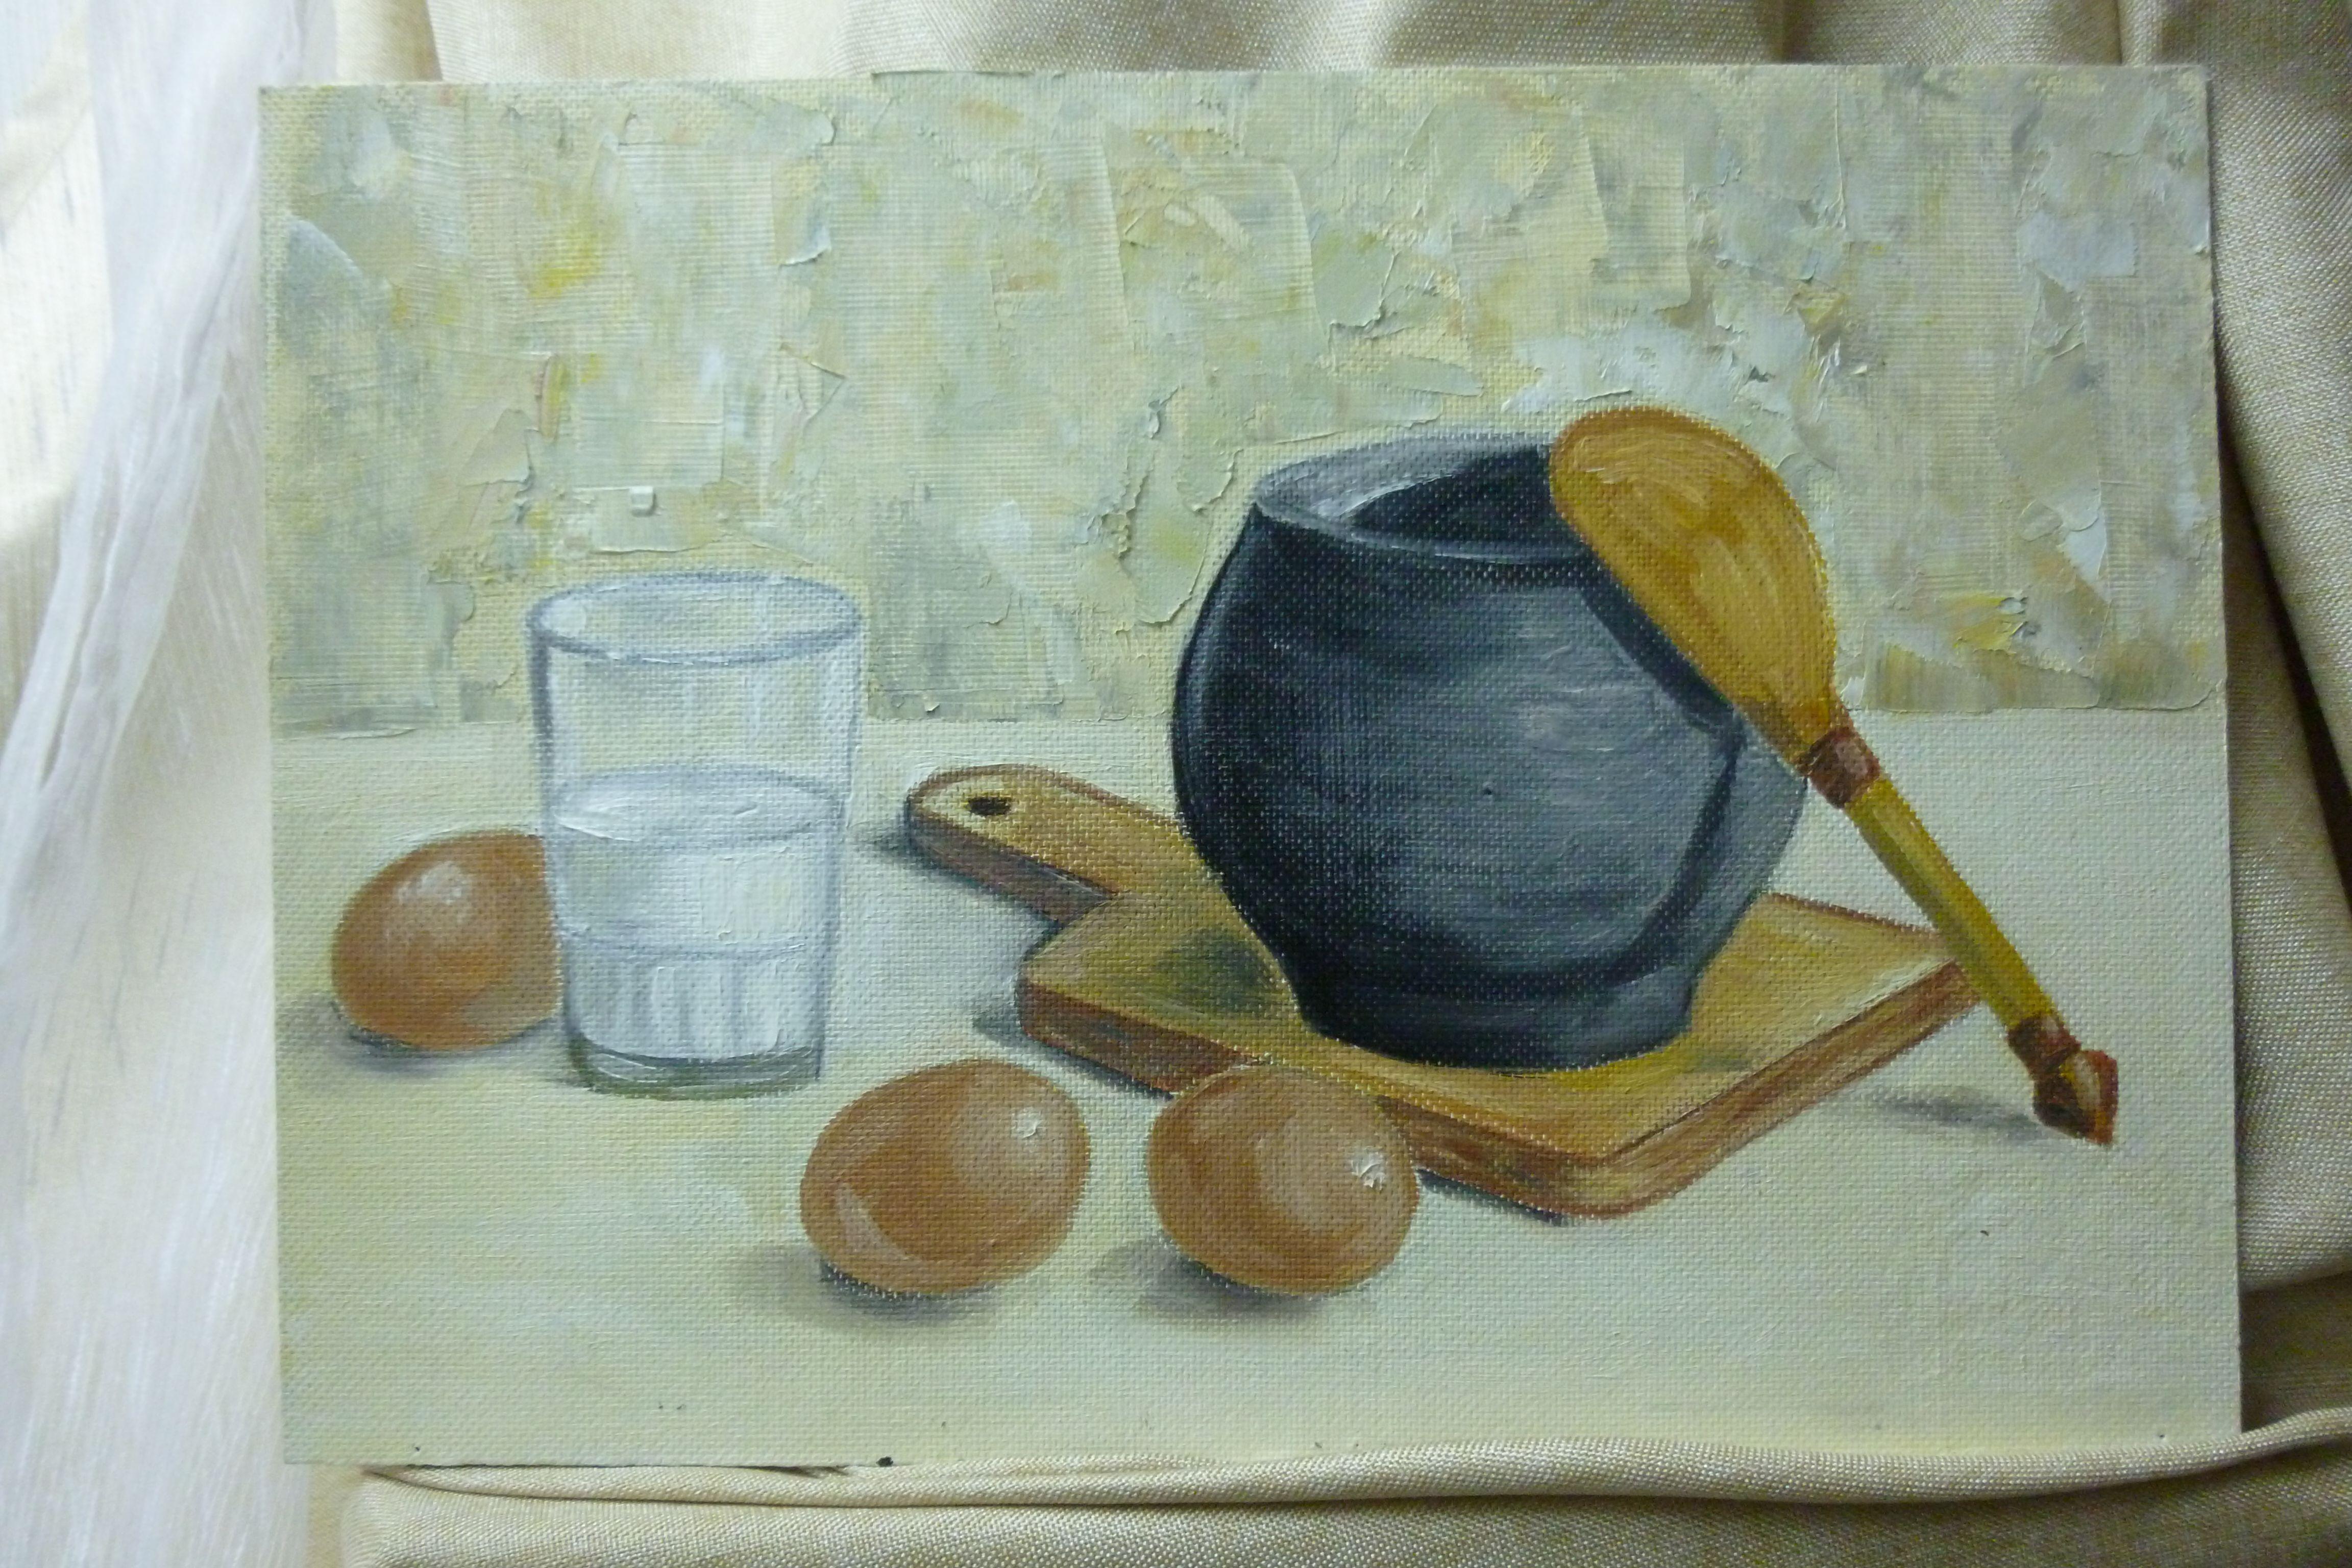 картинамаслом натюрморт стакан молоко яйца теплый чугунок ложка свет